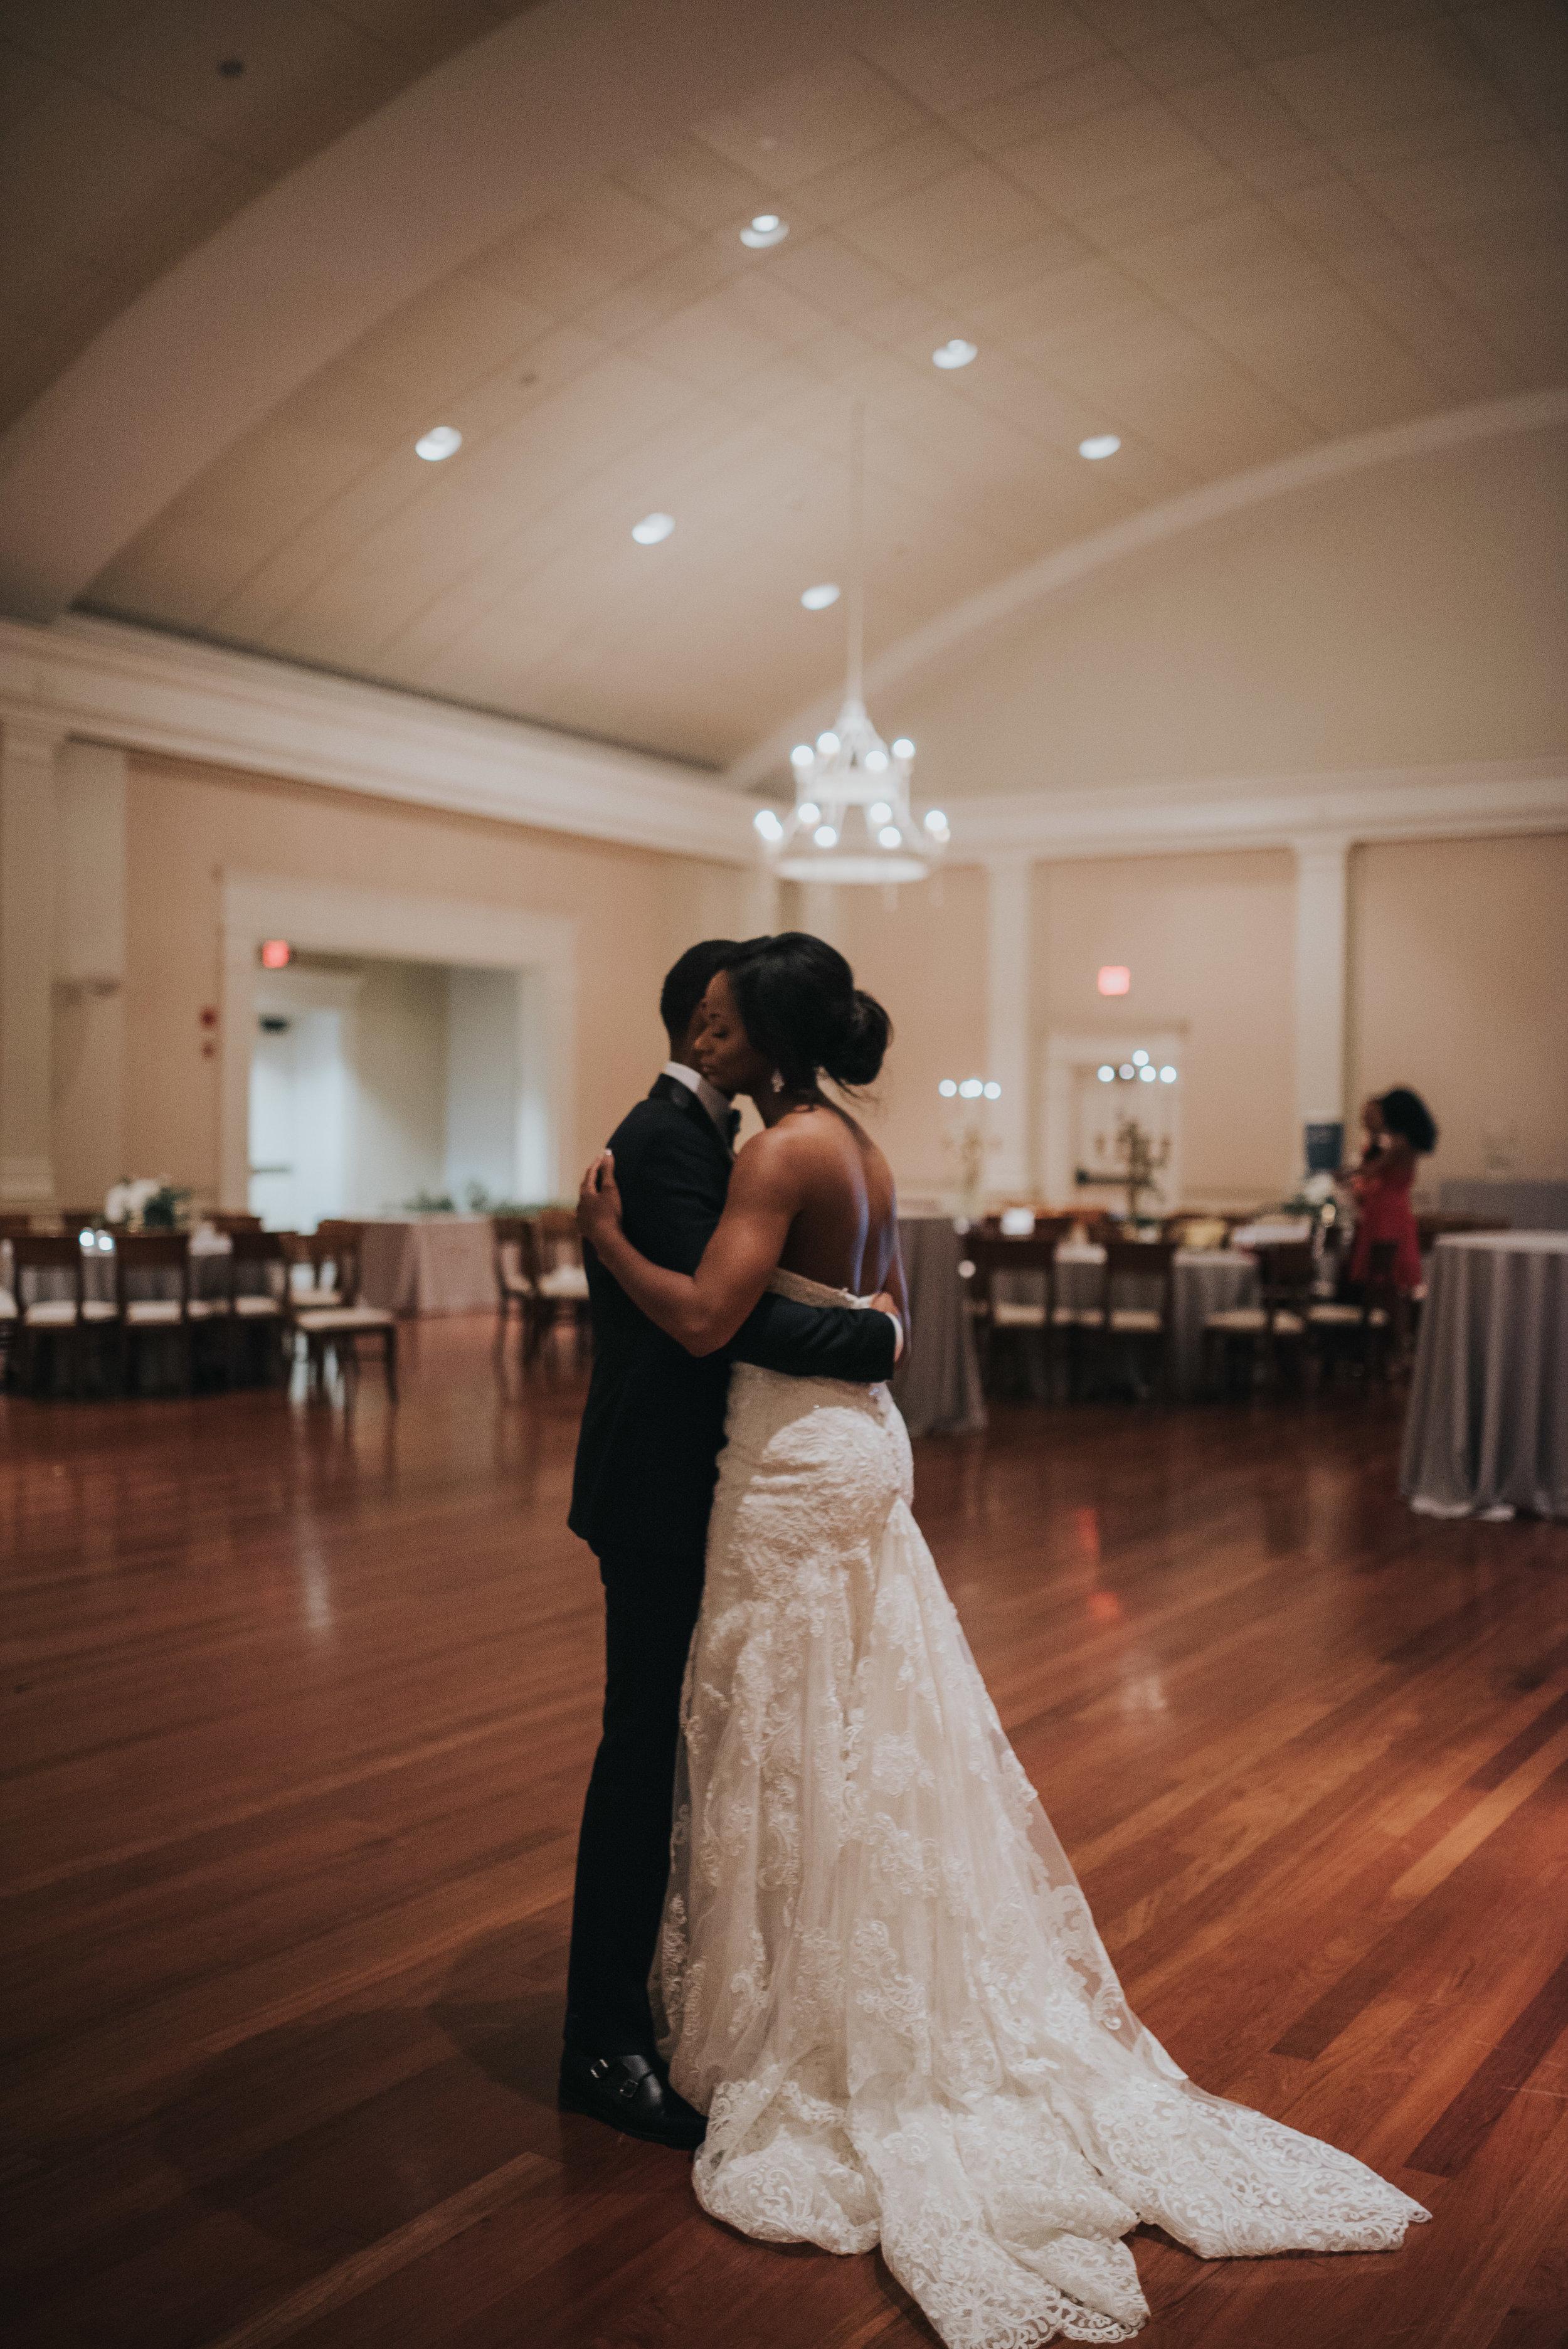 Bride and groom last dance at Atlanta History Center wedding reception